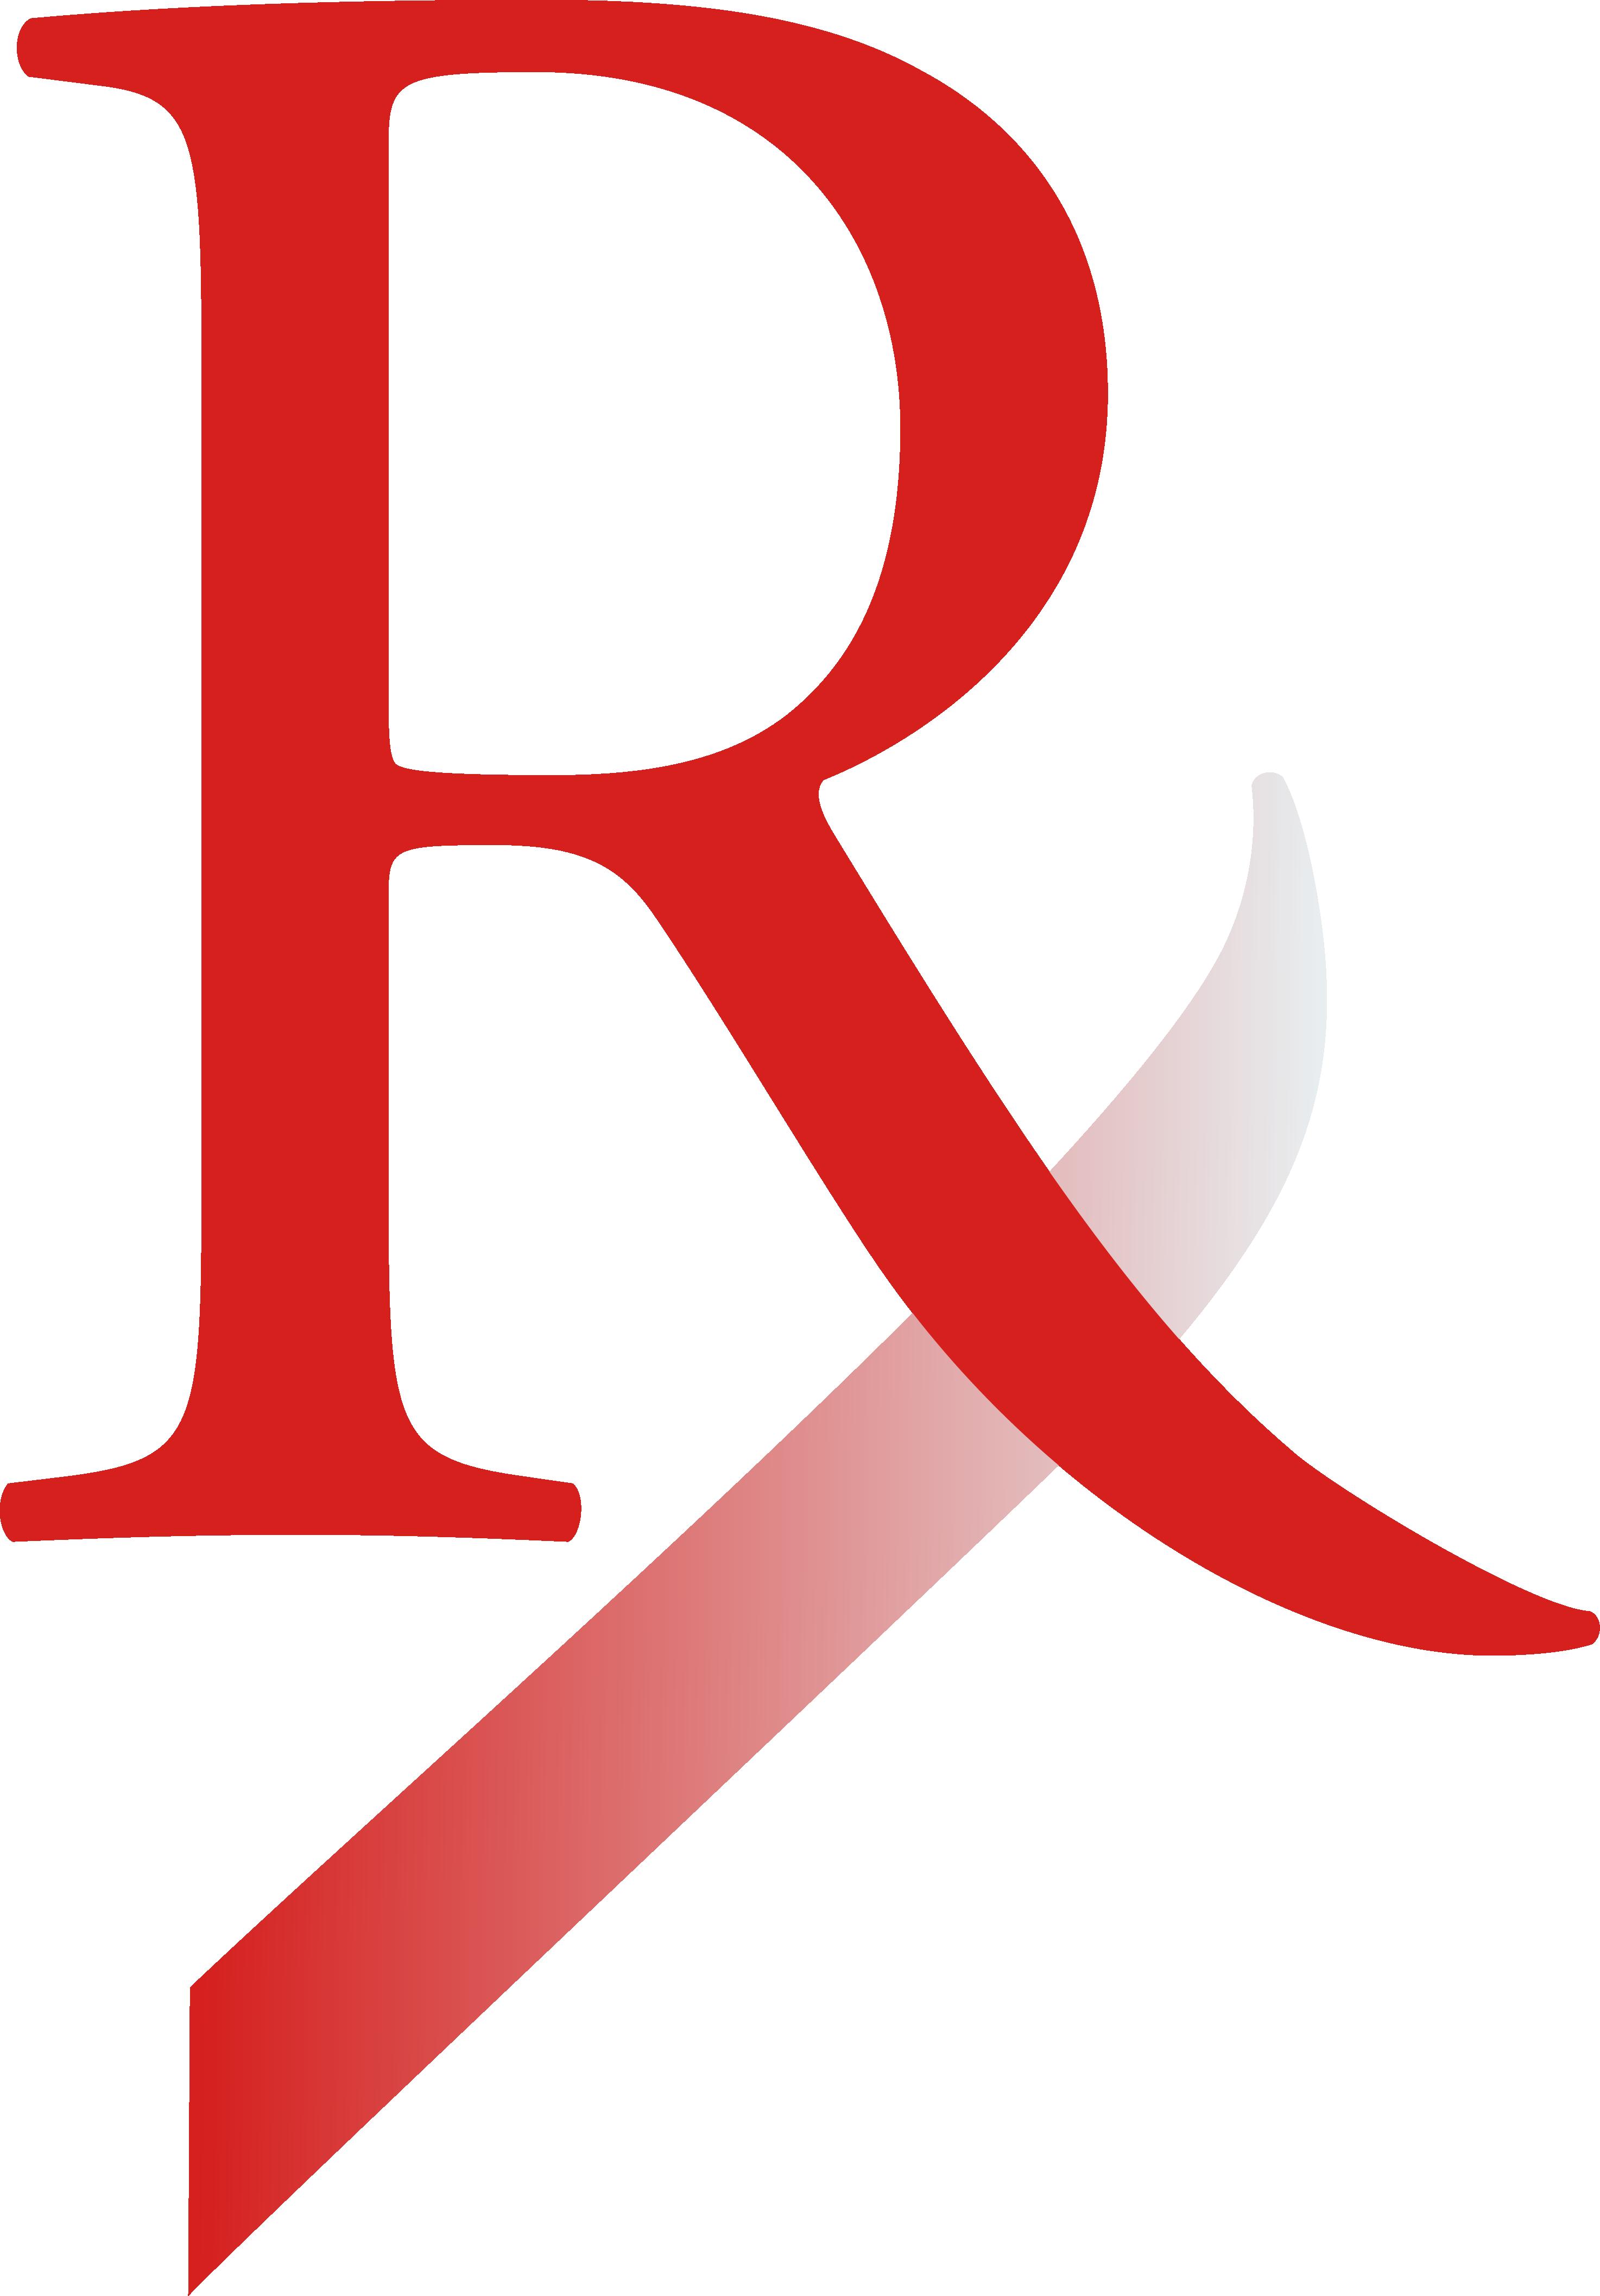 Rubicon pharmacies as pharmacists. Pharmacy clipart pharmasist